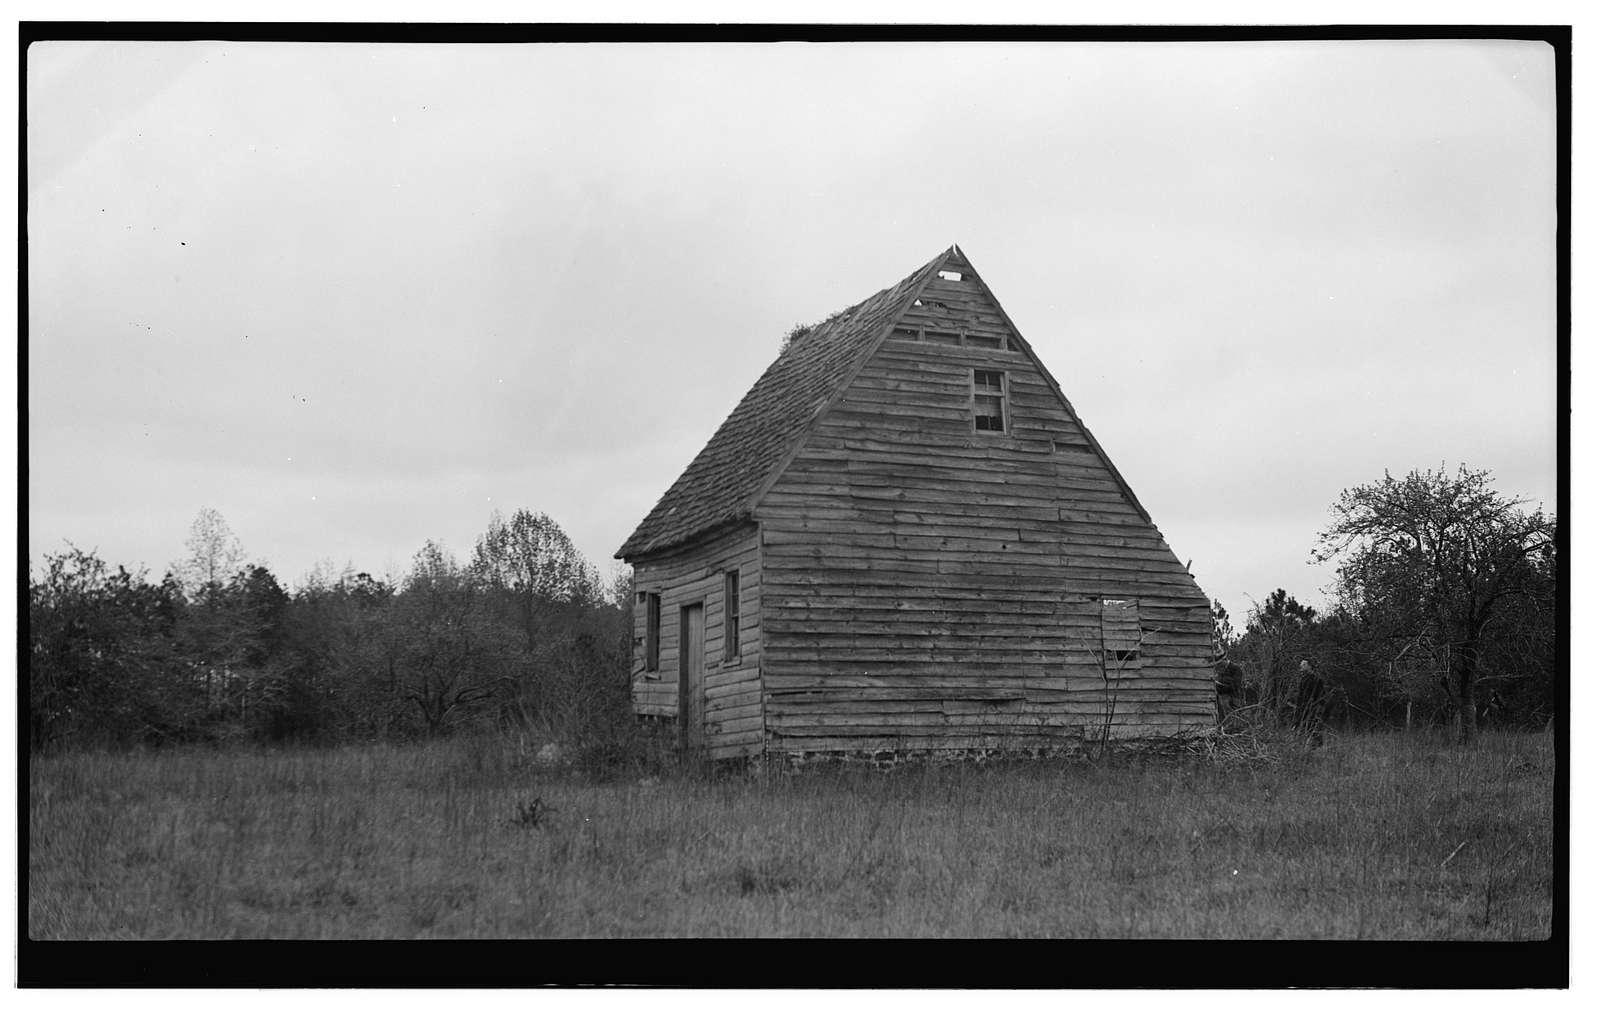 Elmore House, State Route 3, Warsaw, Richmond, VA